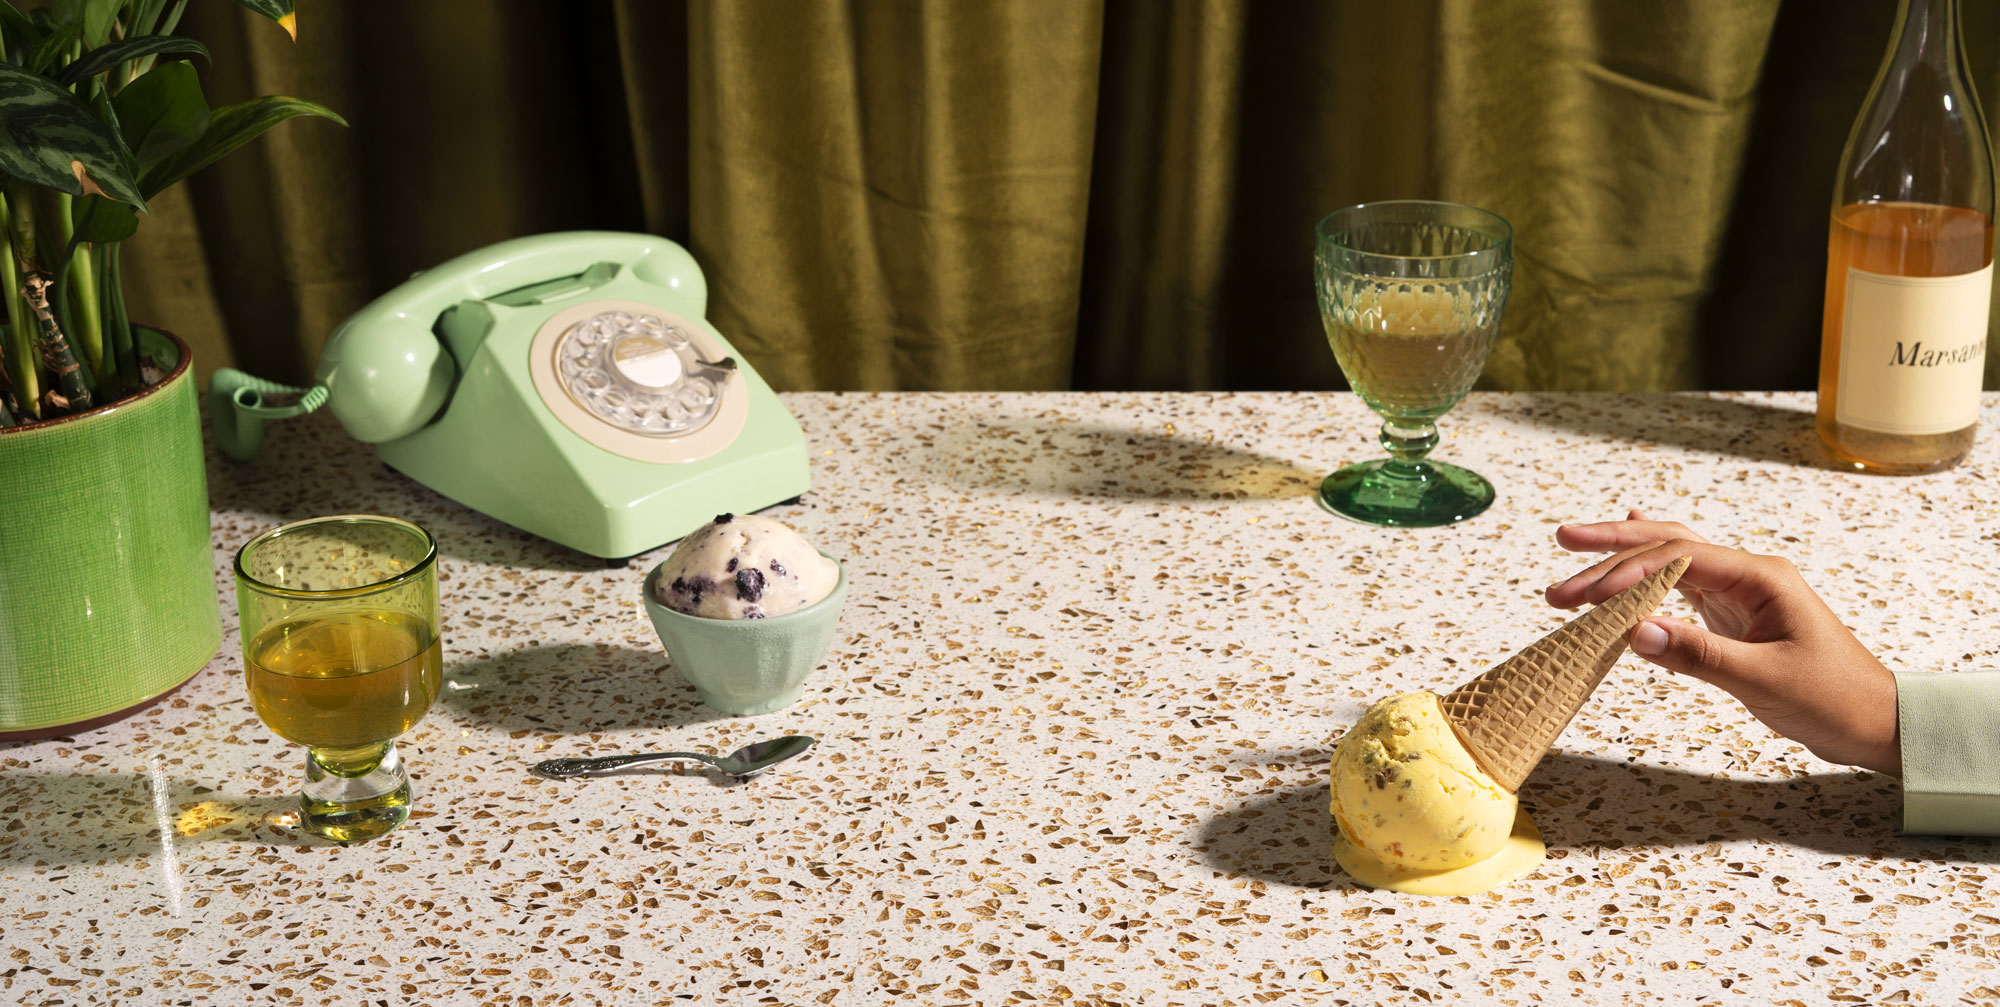 a still life featuring ice cream